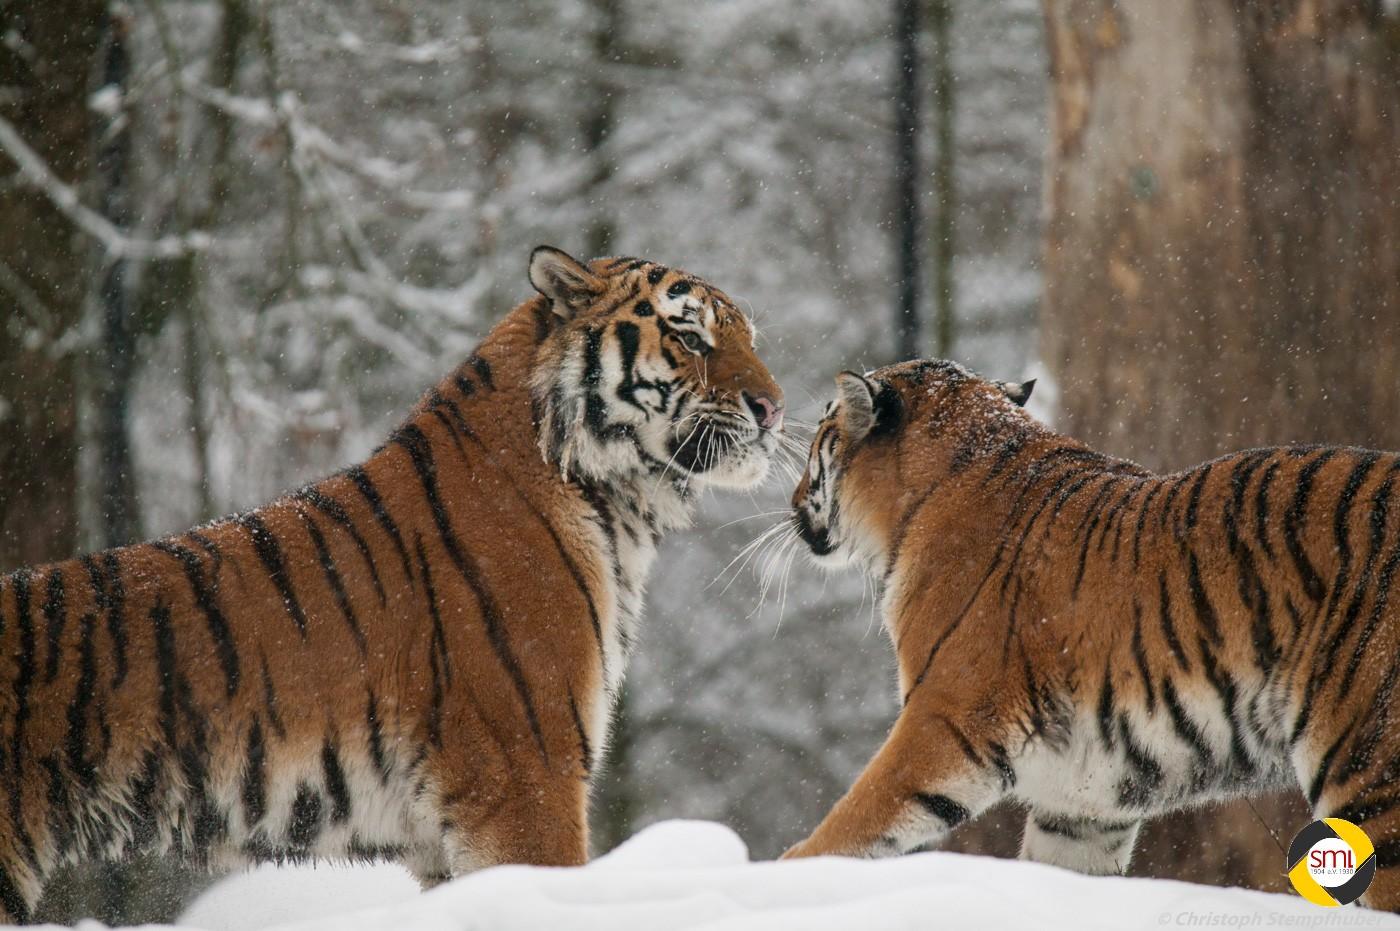 Tiger im Schnee © Christoph Stempfhuber